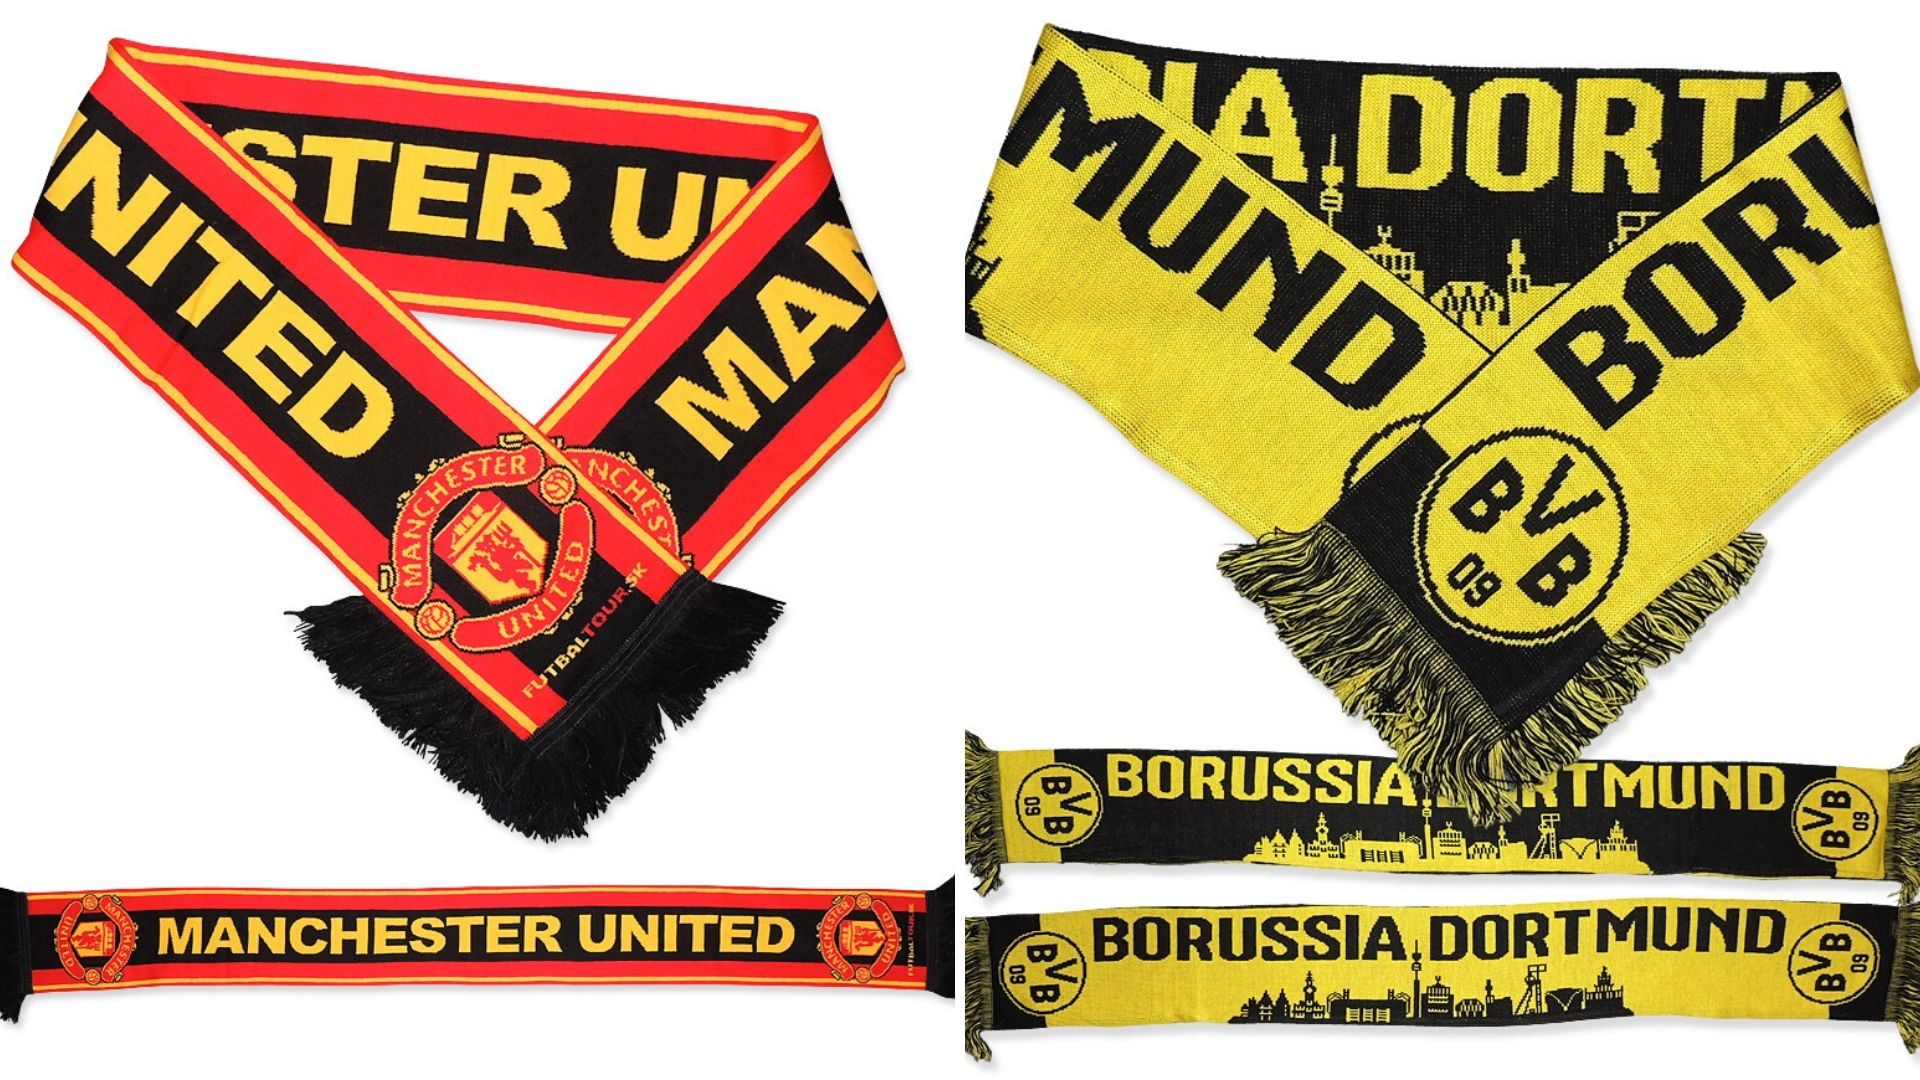 futbaltour sal manchester united borussia dortmund eshop